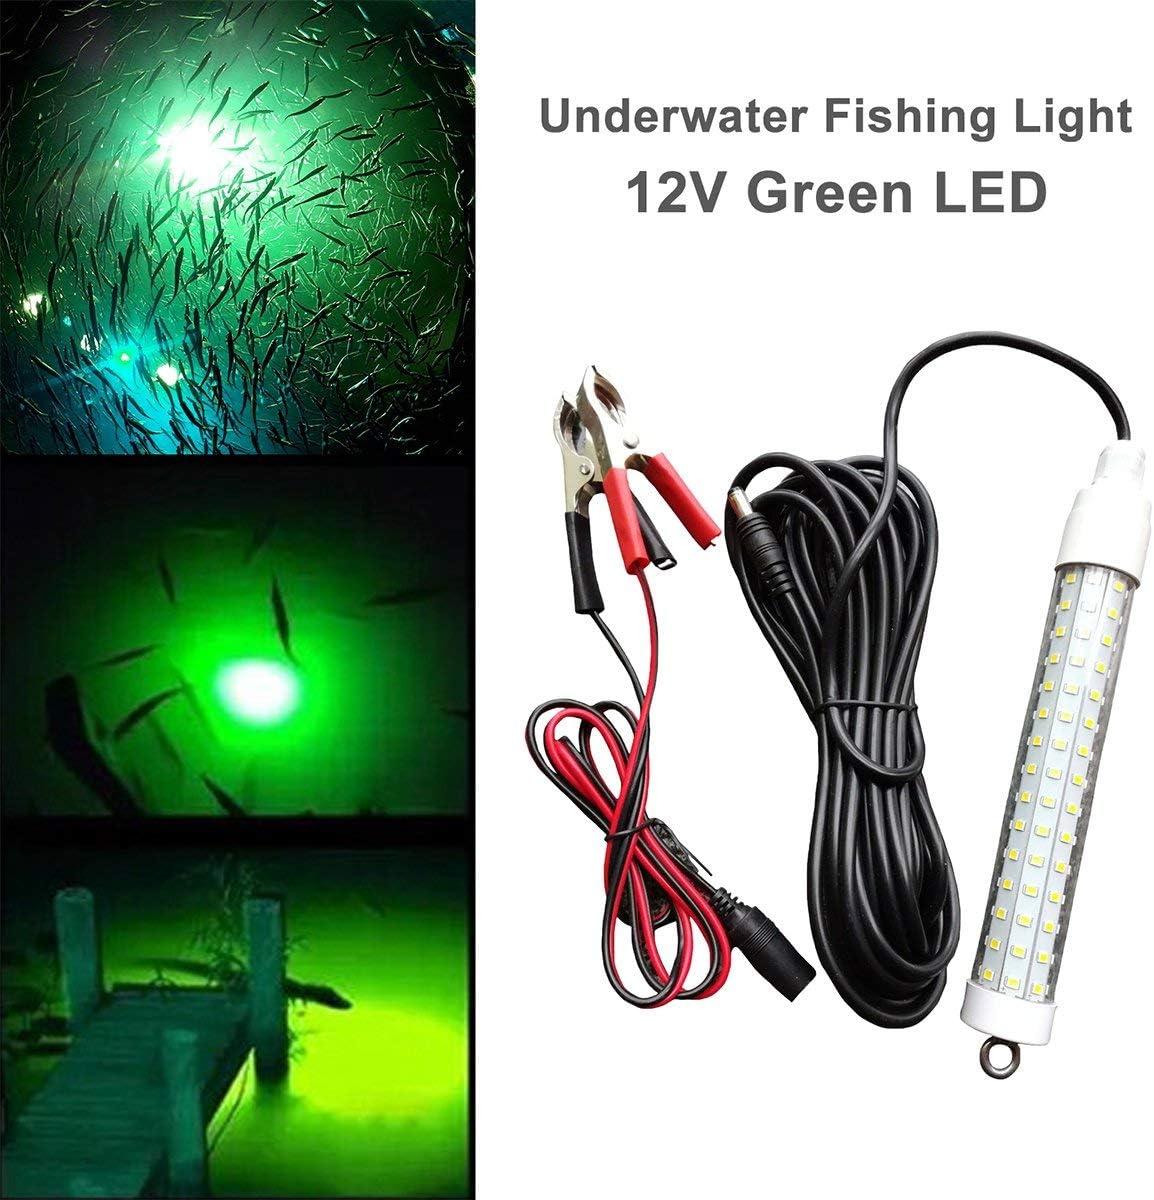 Linkstyle 12V LED Underwater Fishing Light